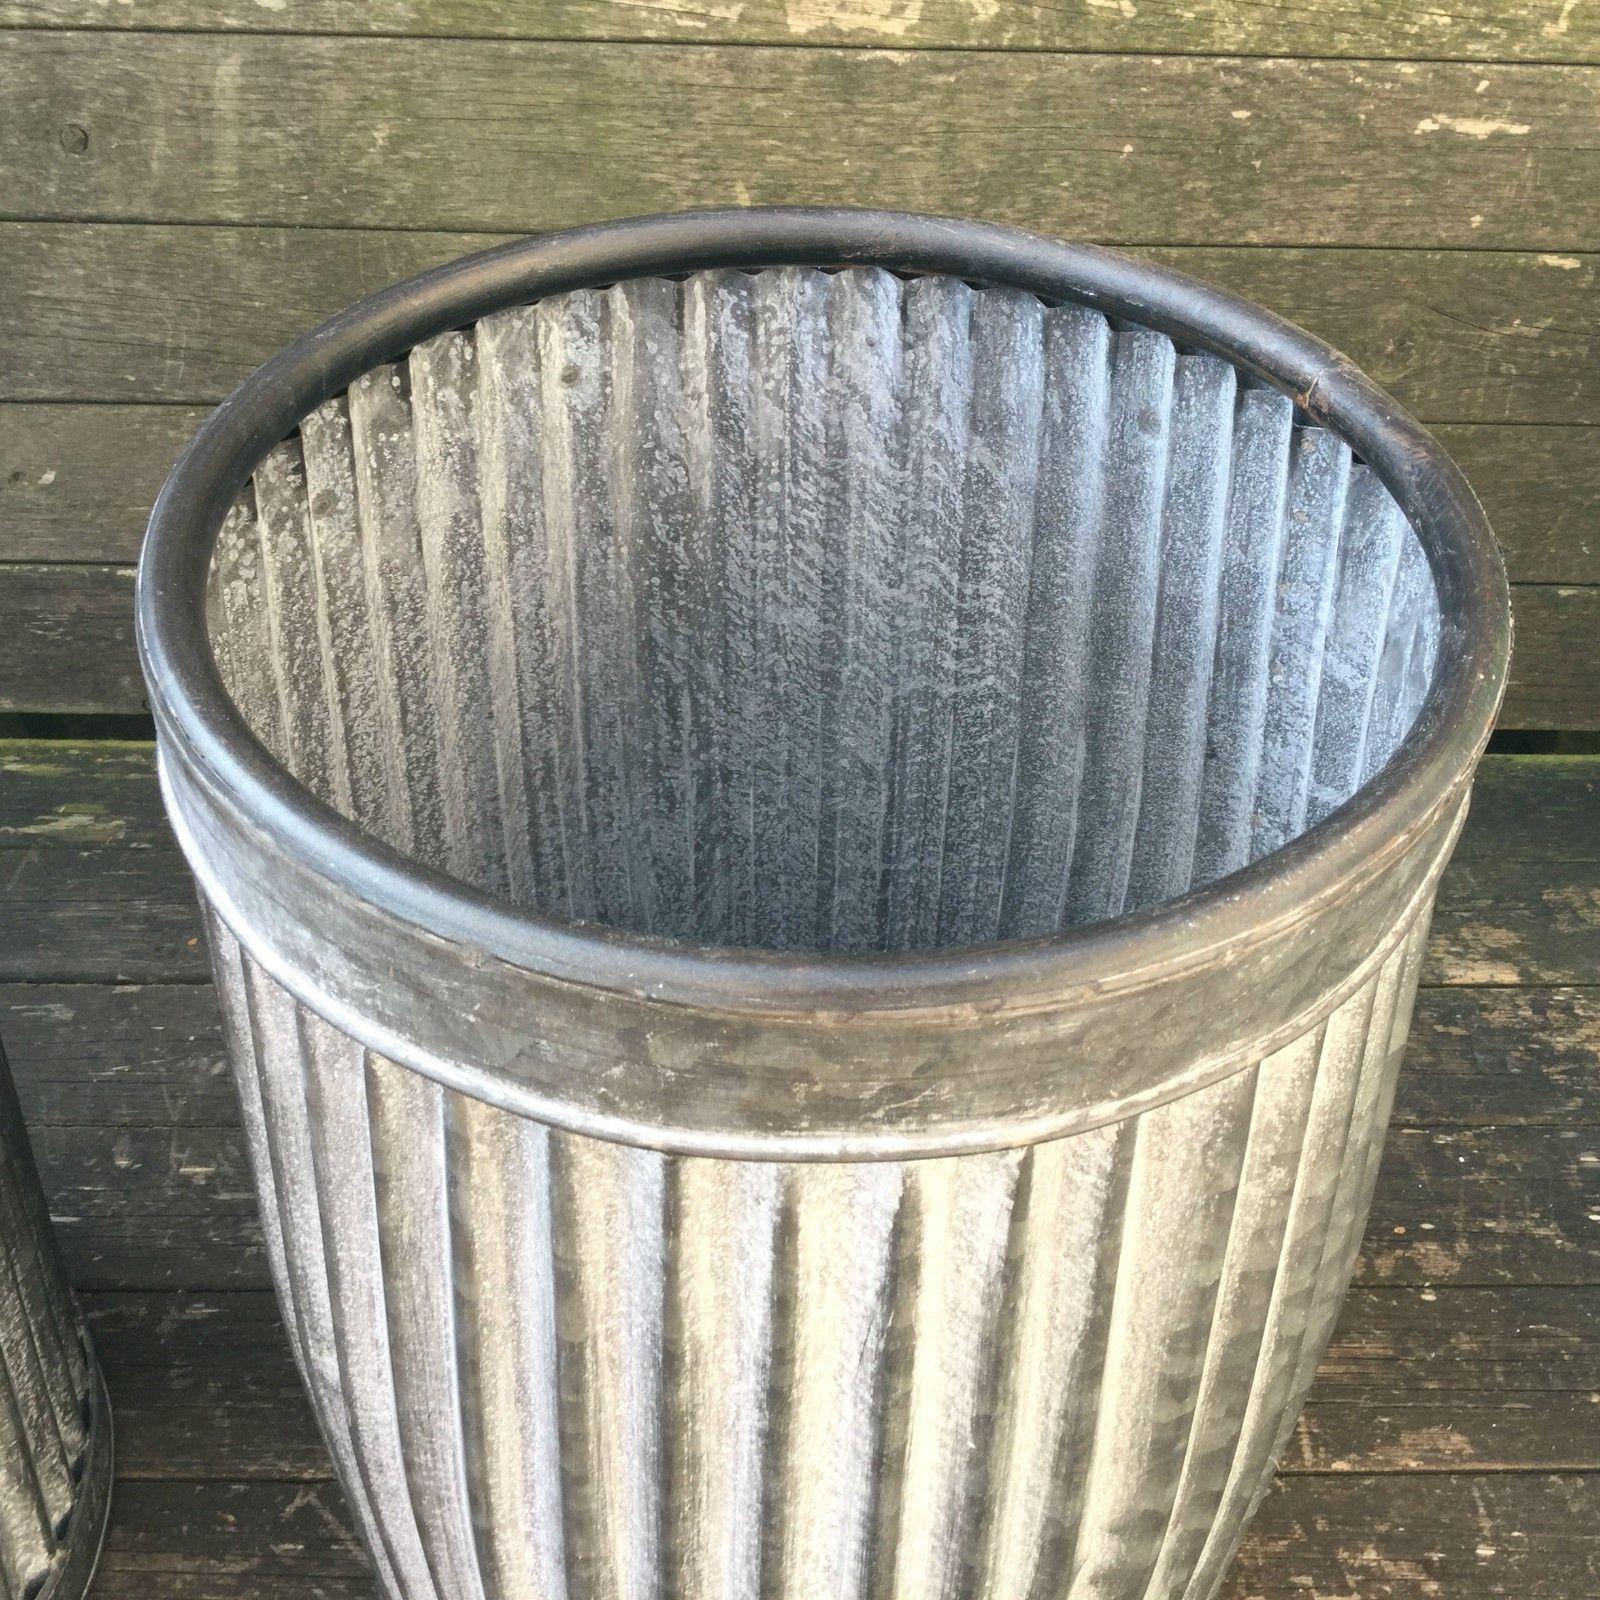 Vintage Style Grey Zinc Galvanised Metal Garden Planter